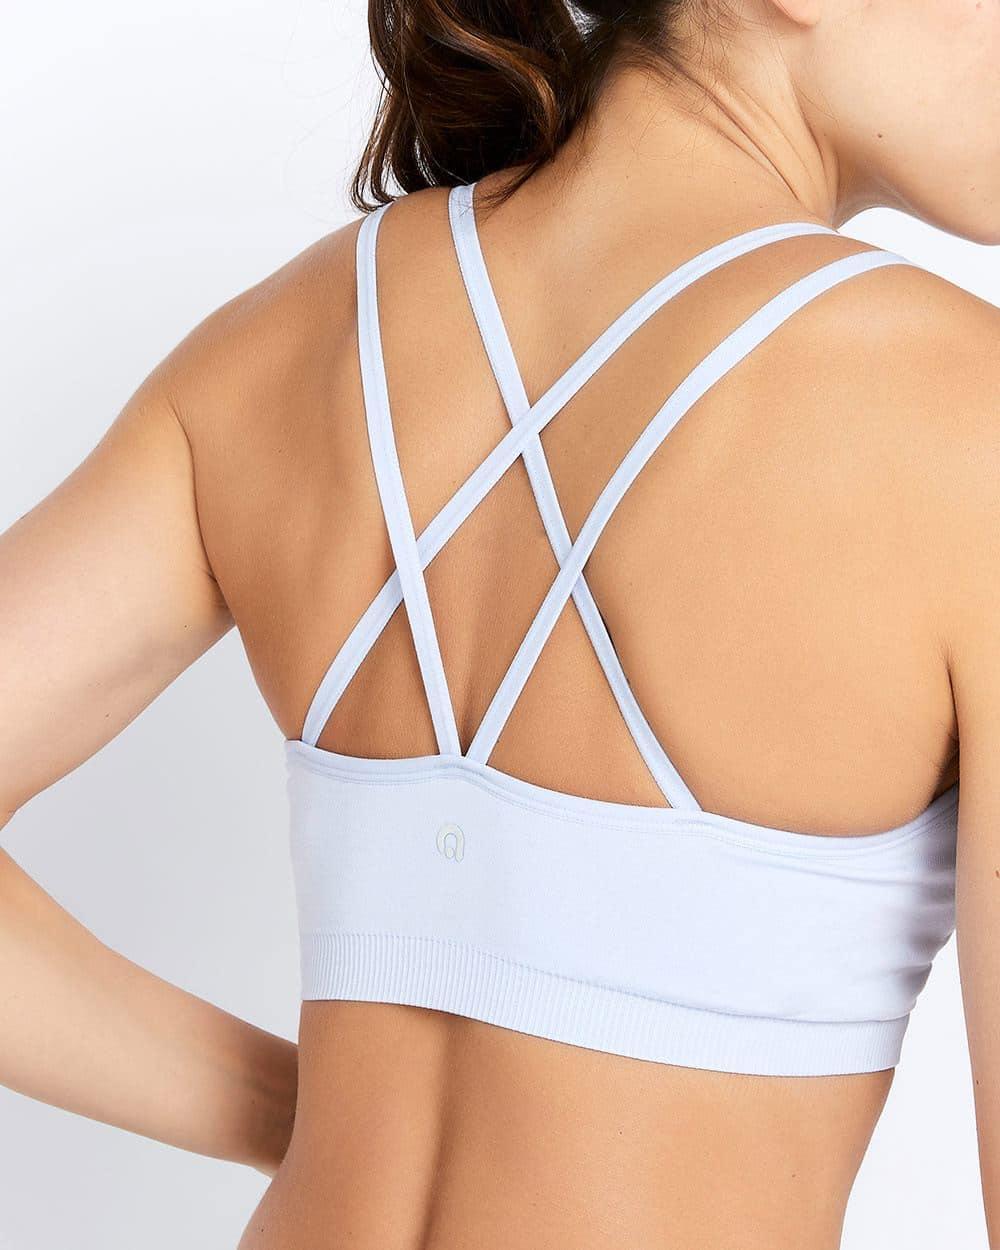 Hyba Multi-Strap Low-Support Sports Bra